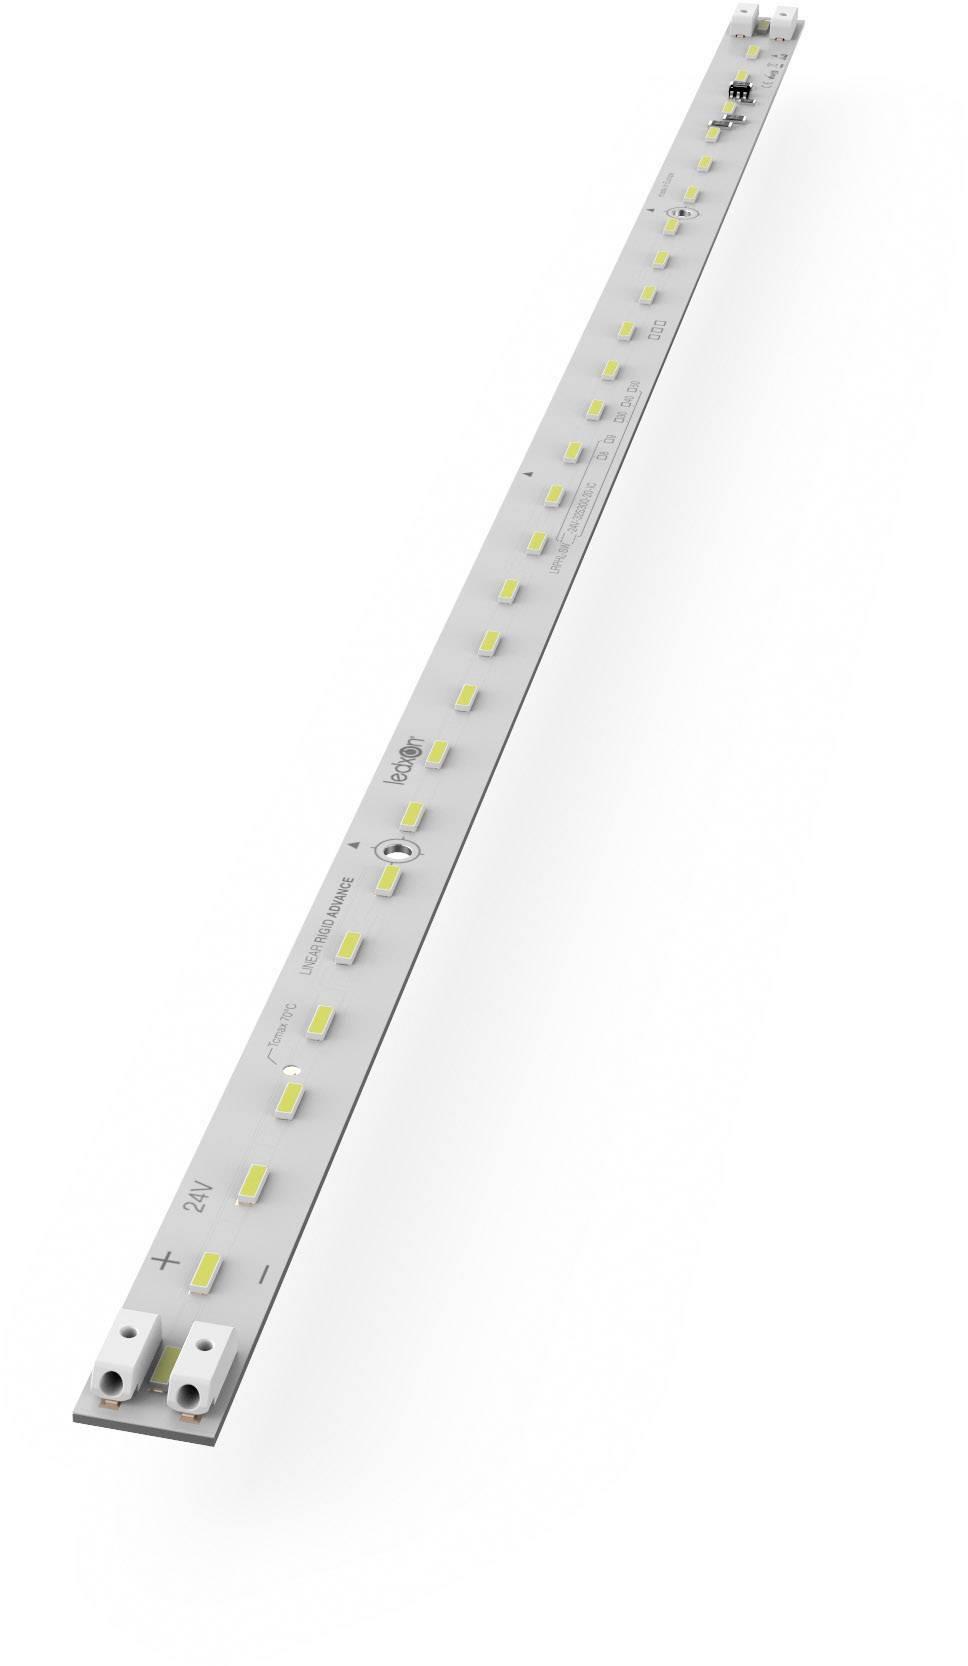 LED lišta ledxon LRAML-SW850-24V-28S103-20-IC 9009368, 24 V, studená bílá, 30 cm